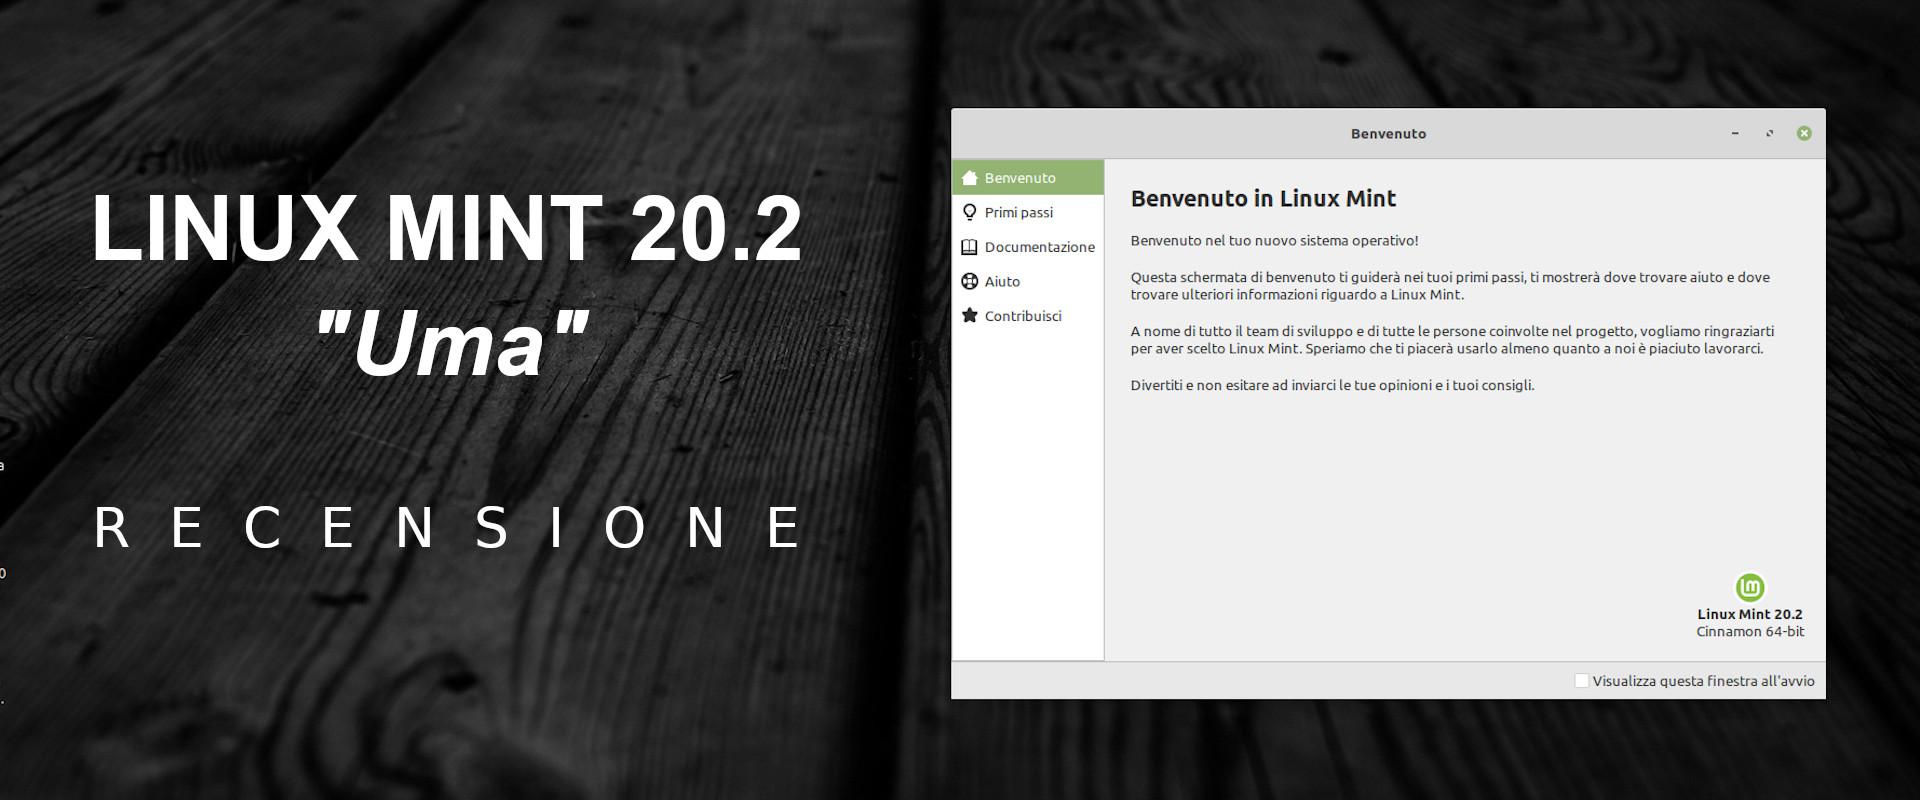 recensione Linux Mint 20.2 Uma copertina